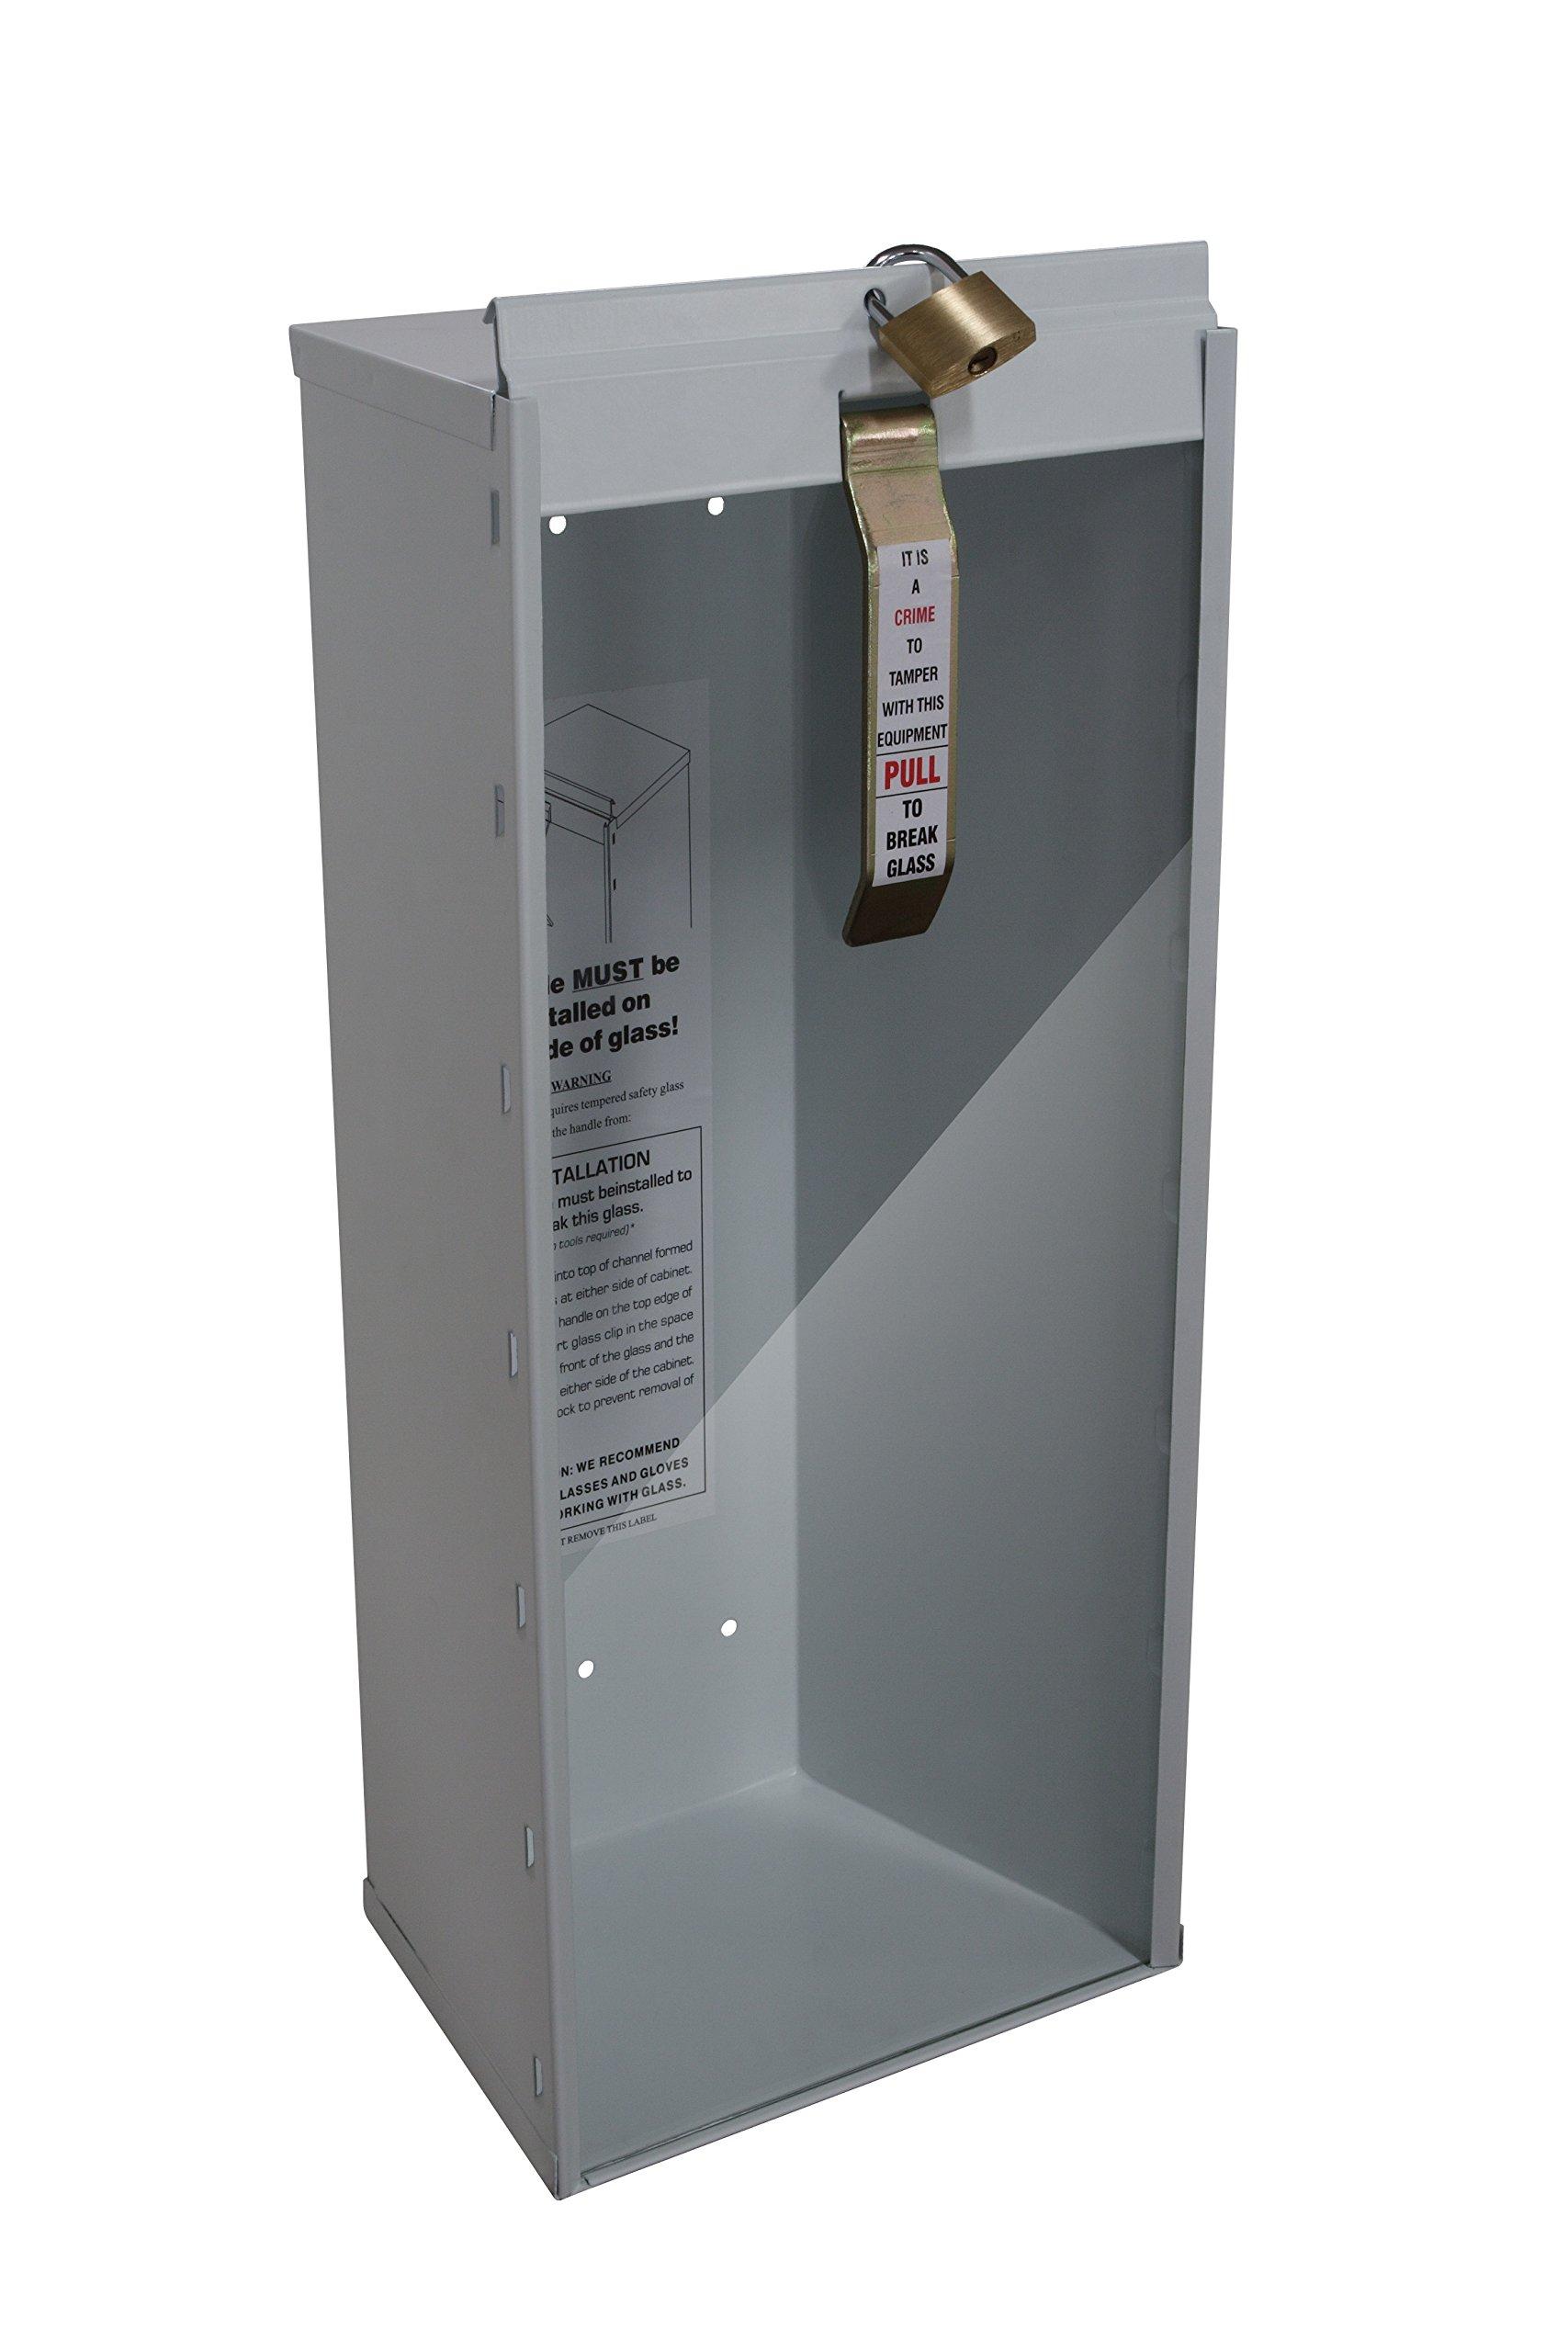 Sandusky Lee 8018-9 Fire Extinguisher Cabinet, Industrial Grade, 5 lb, White